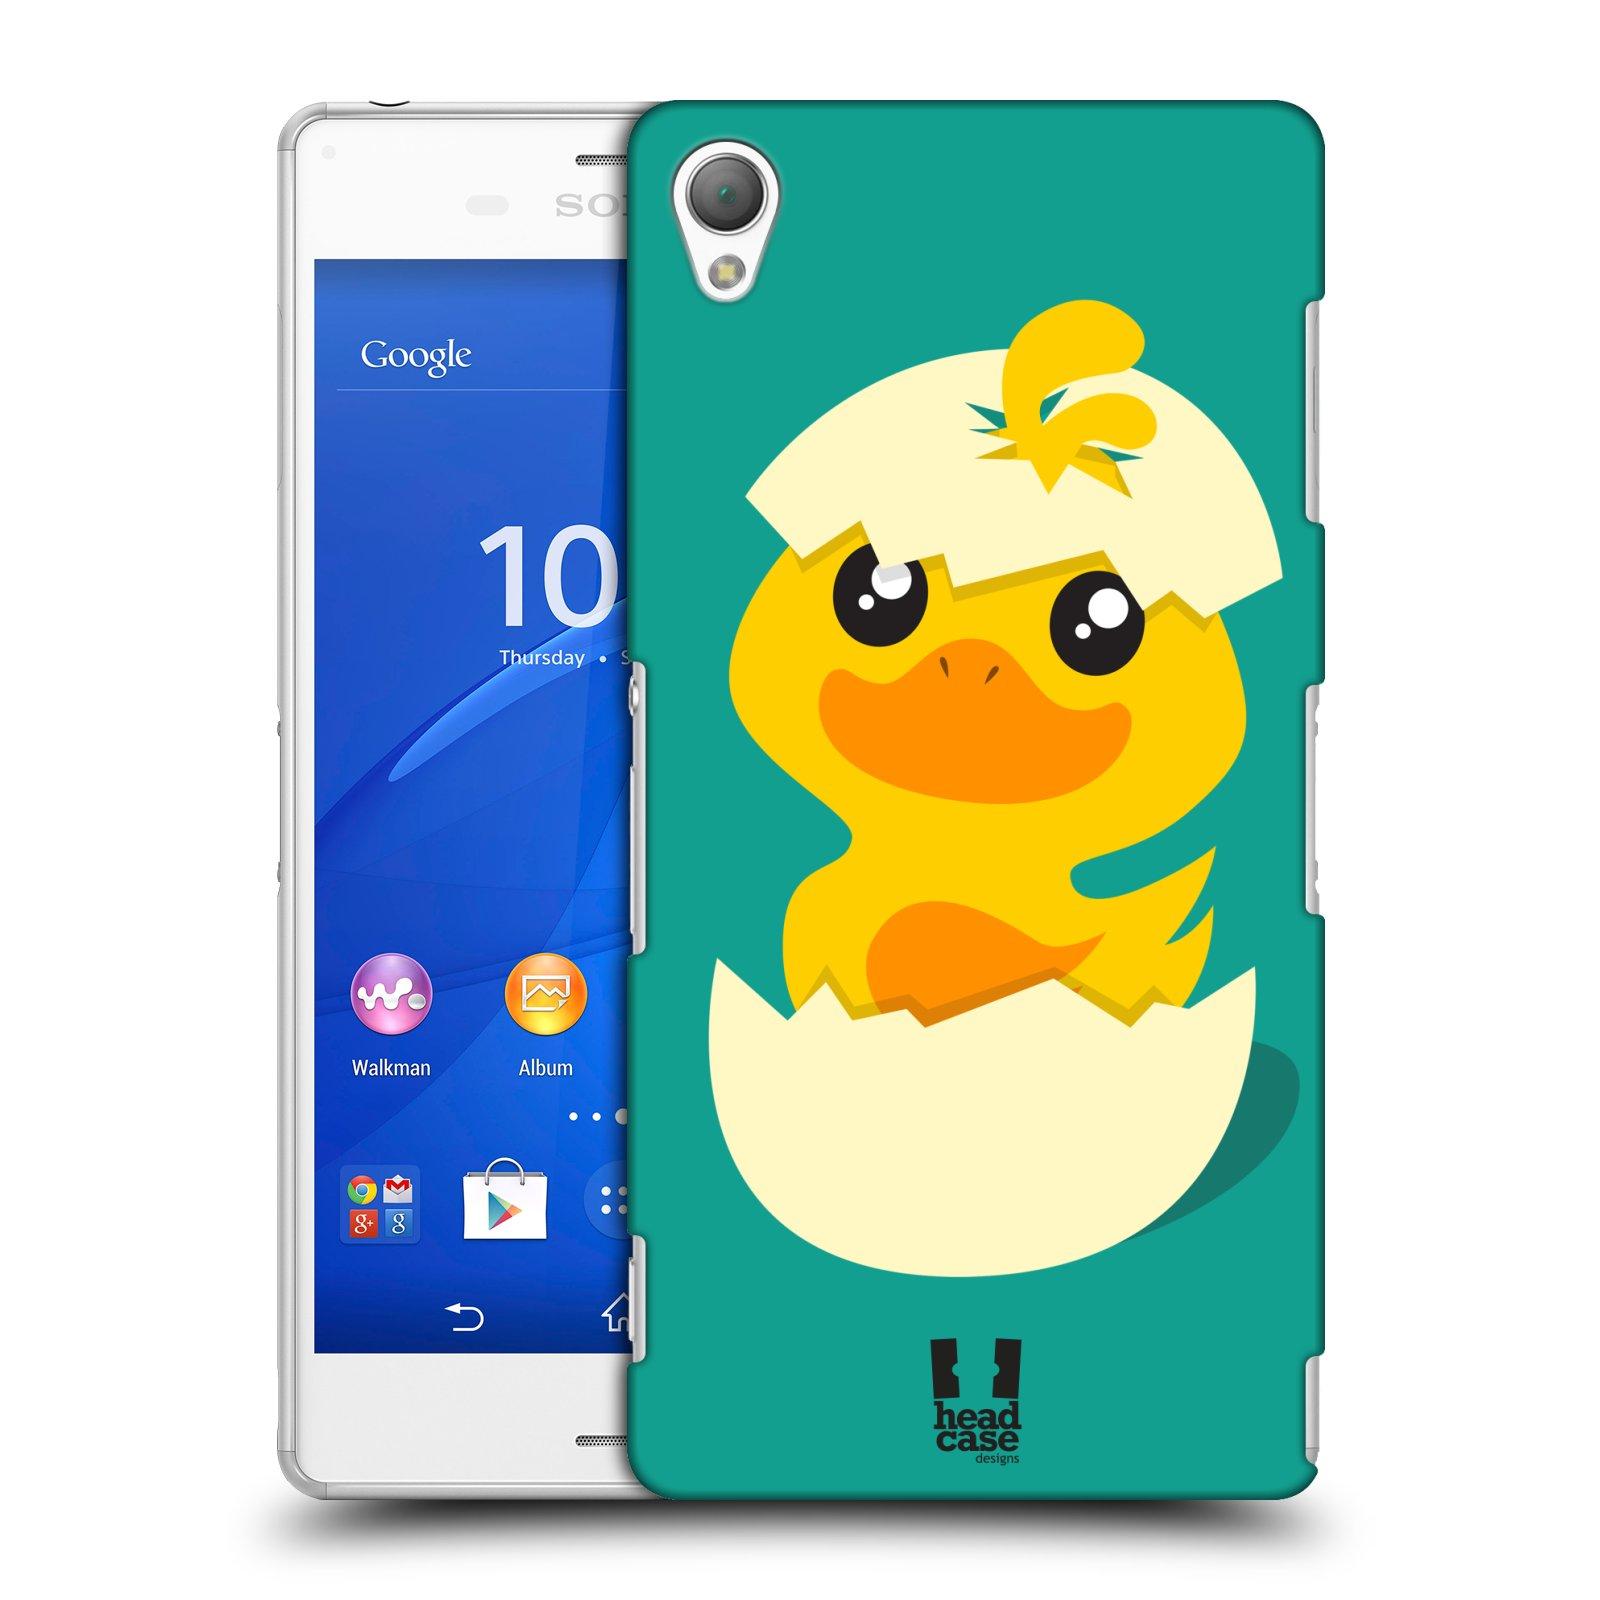 Plastové pouzdro na mobil Sony Xperia Z3 D6603 HEAD CASE KACHNIČKA Z VAJÍČKA (Kryt či obal na mobilní telefon Sony Xperia Z3 )